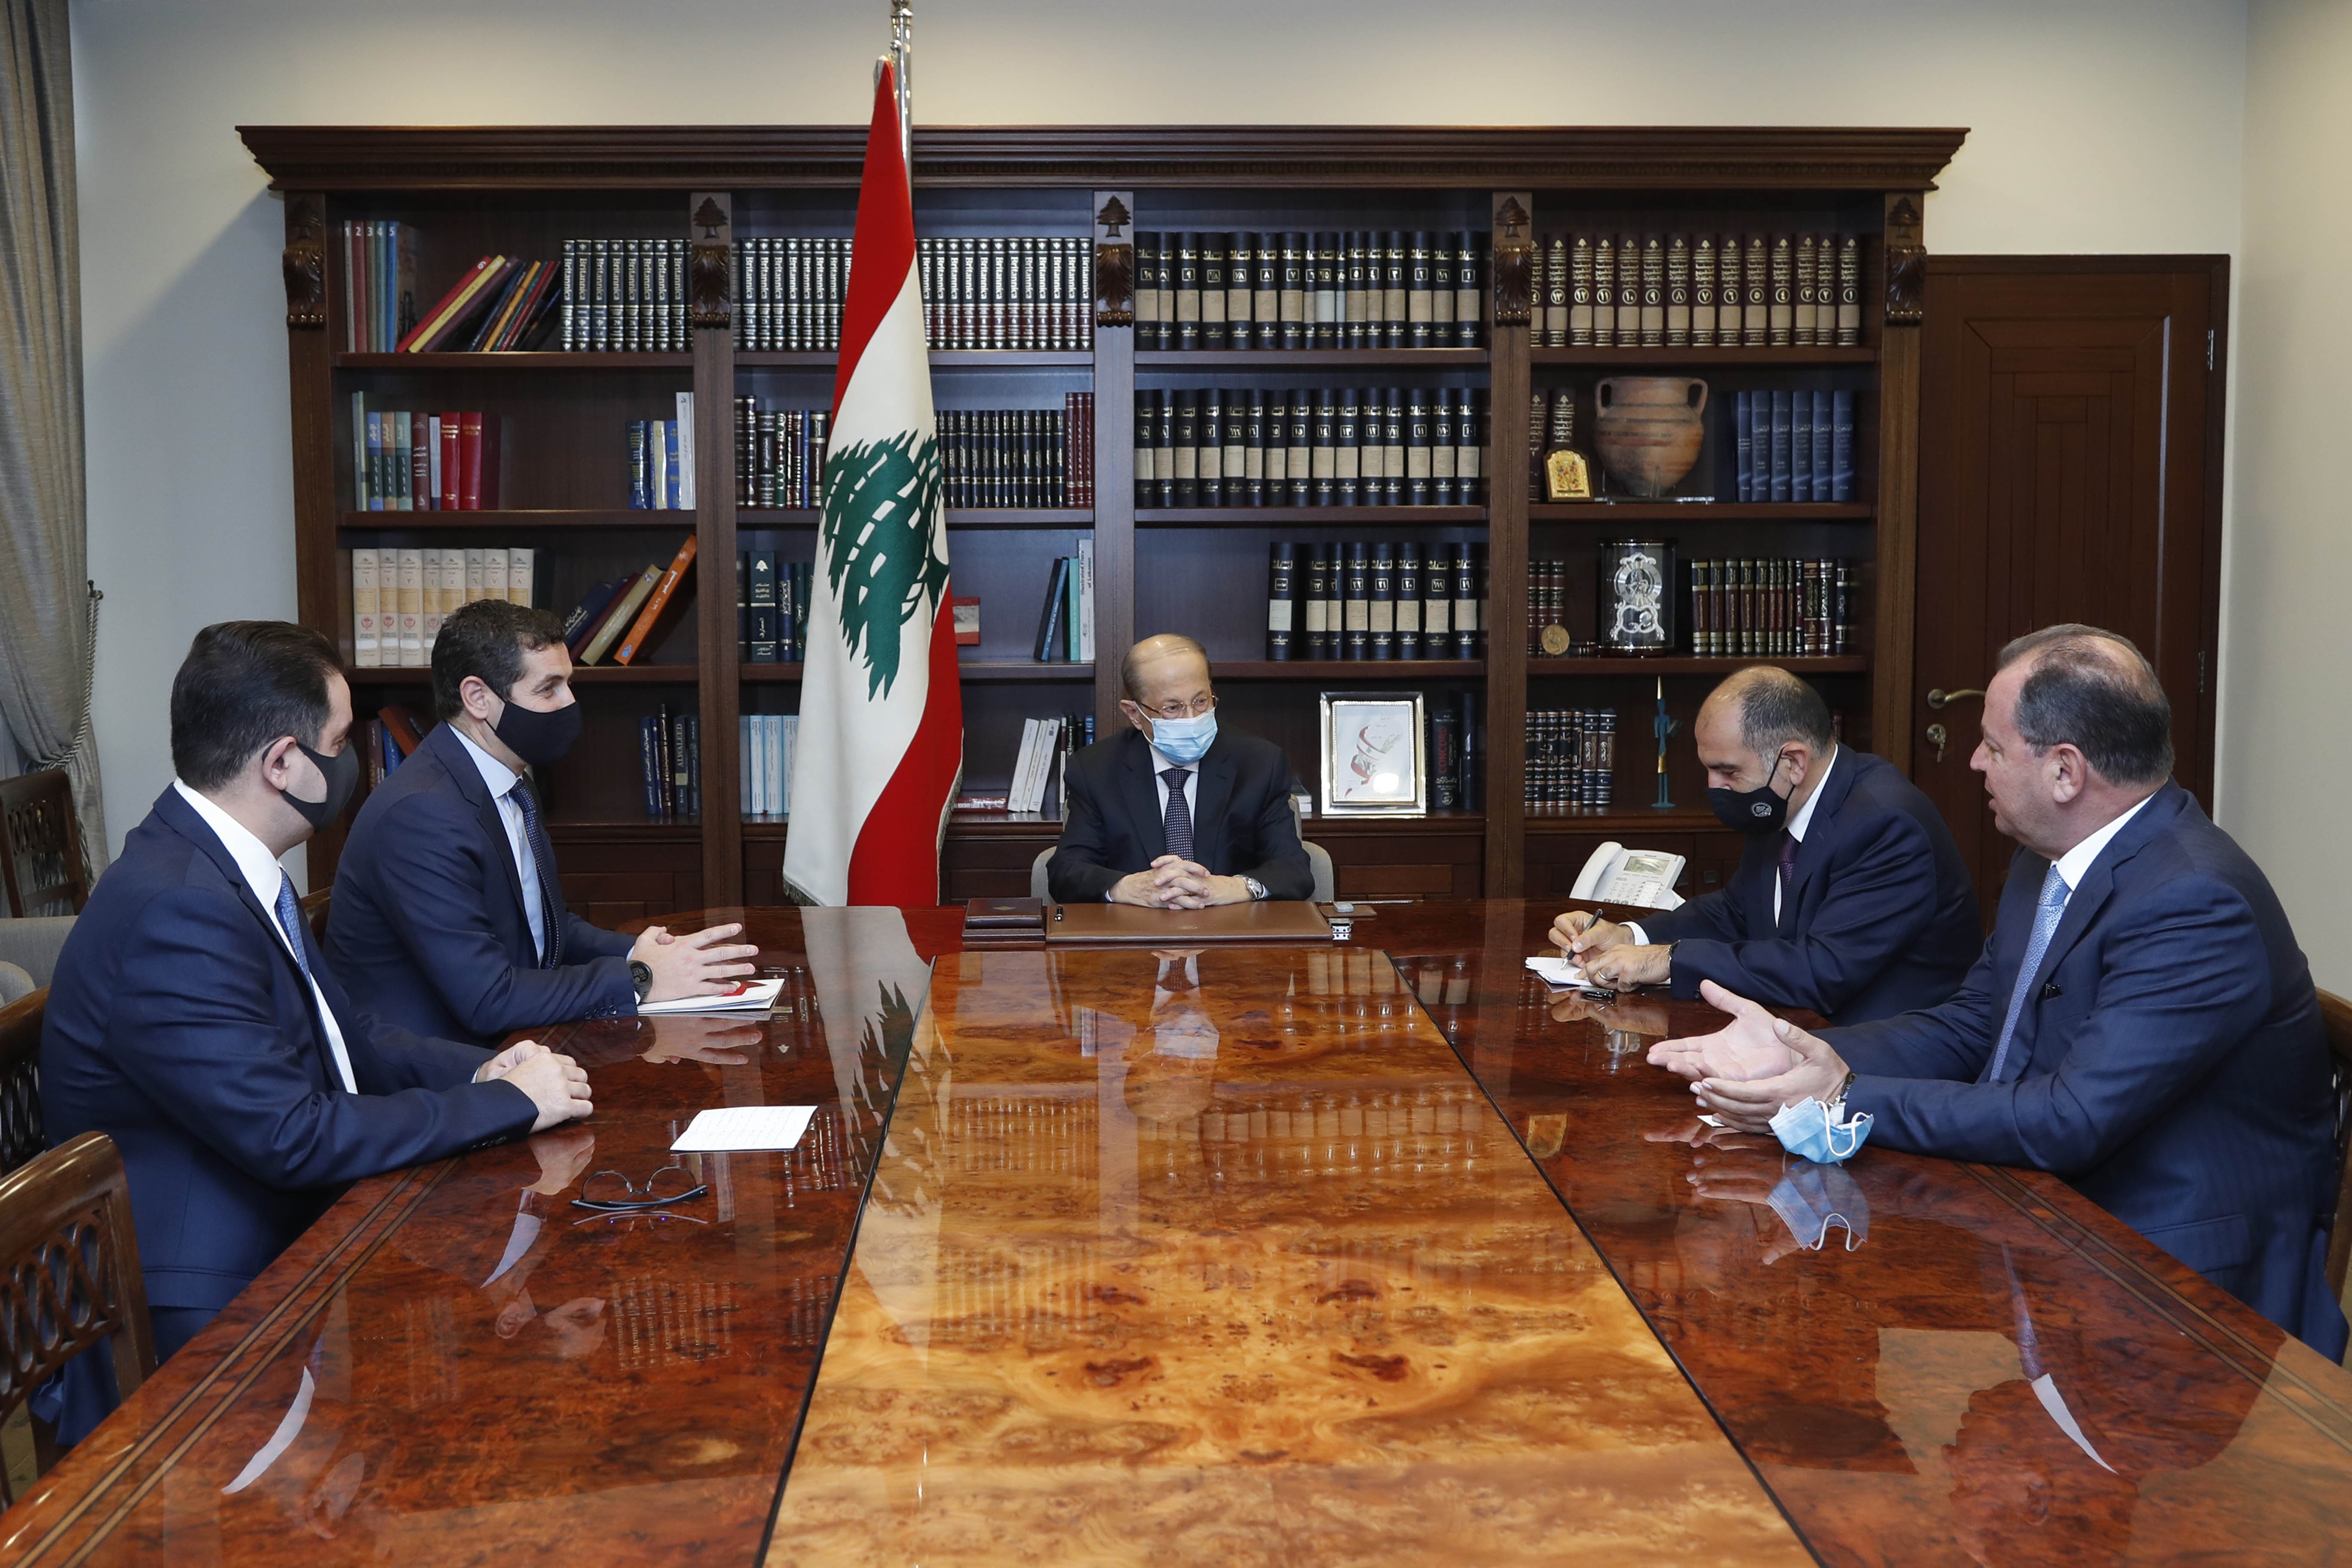 02 - MP Deputy Eddy Maalouf, and Mr. Jean Beyrouthy and Mr.Tony Al-Rami. 01